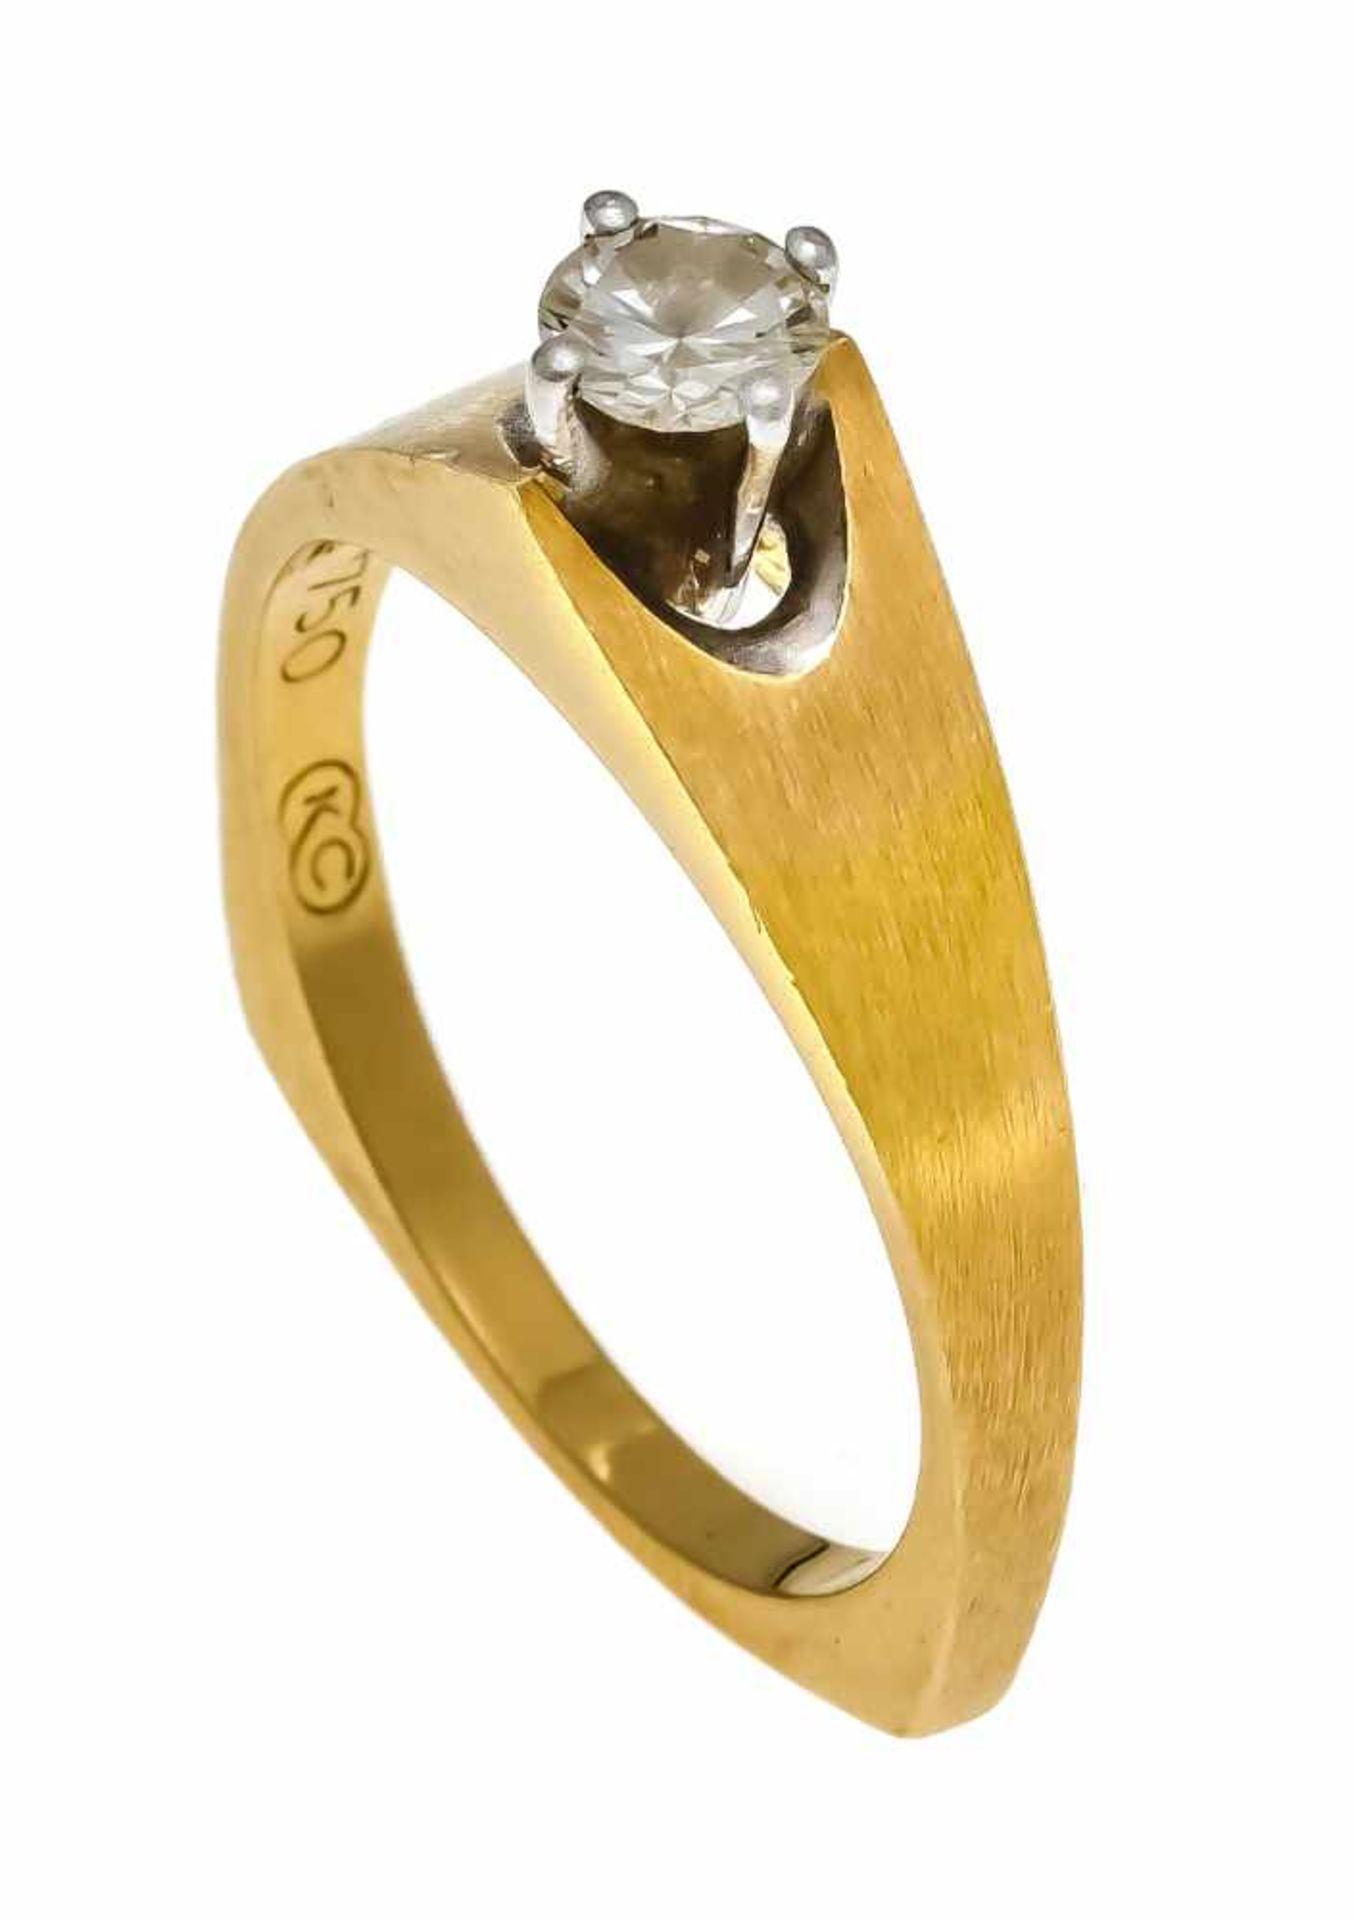 Brillant-Ring GG/WG 750/000 mit Brillant 0,30 ct W/VS, RG 55, Meisterpunze KC, 4,2 gDiamond ring